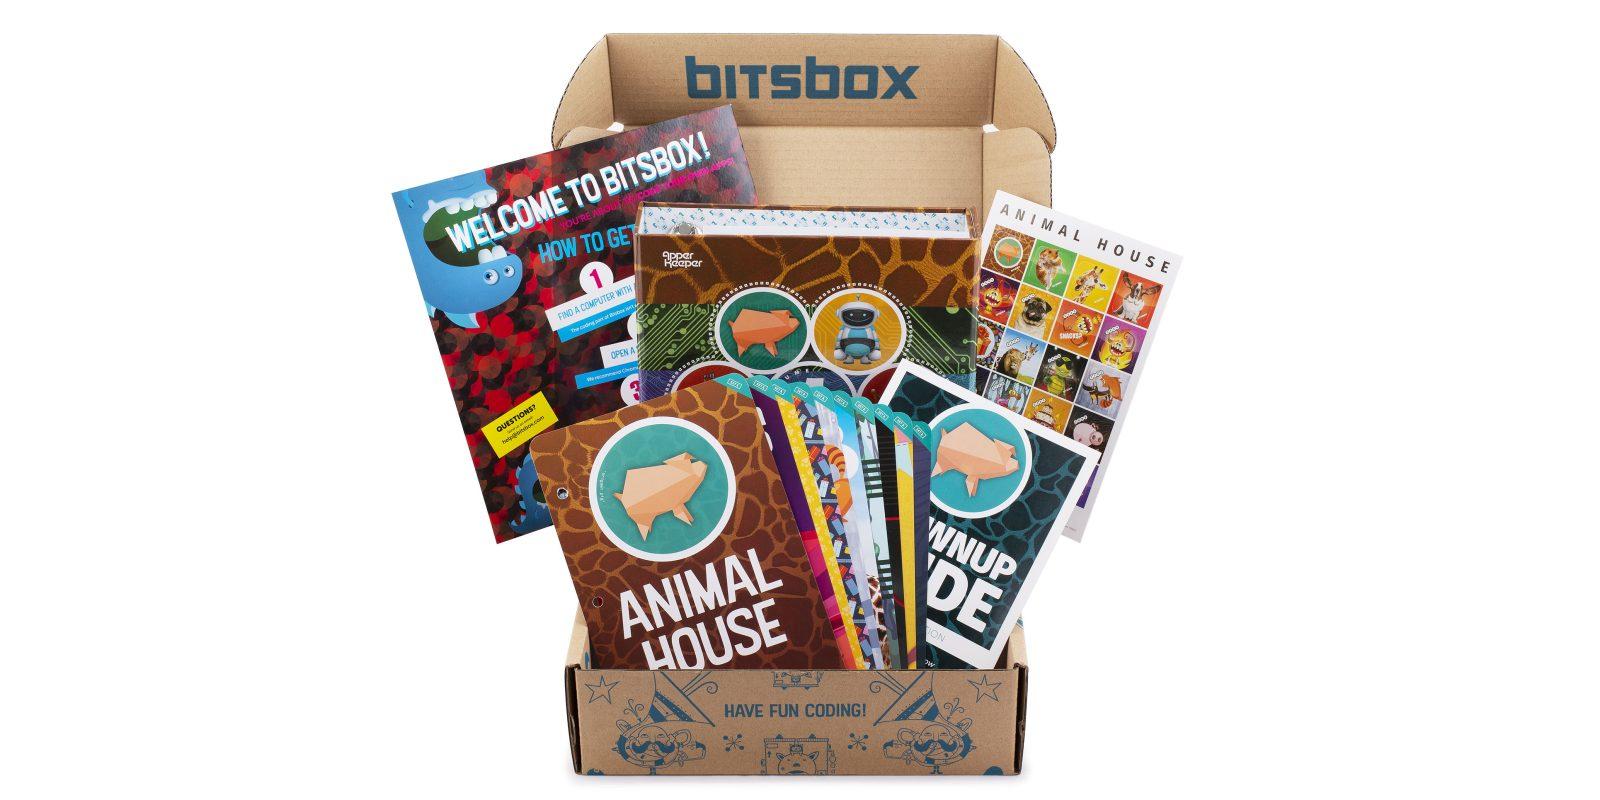 Bitsbox Coding Kits deliver monthly STEM-focused activities, get